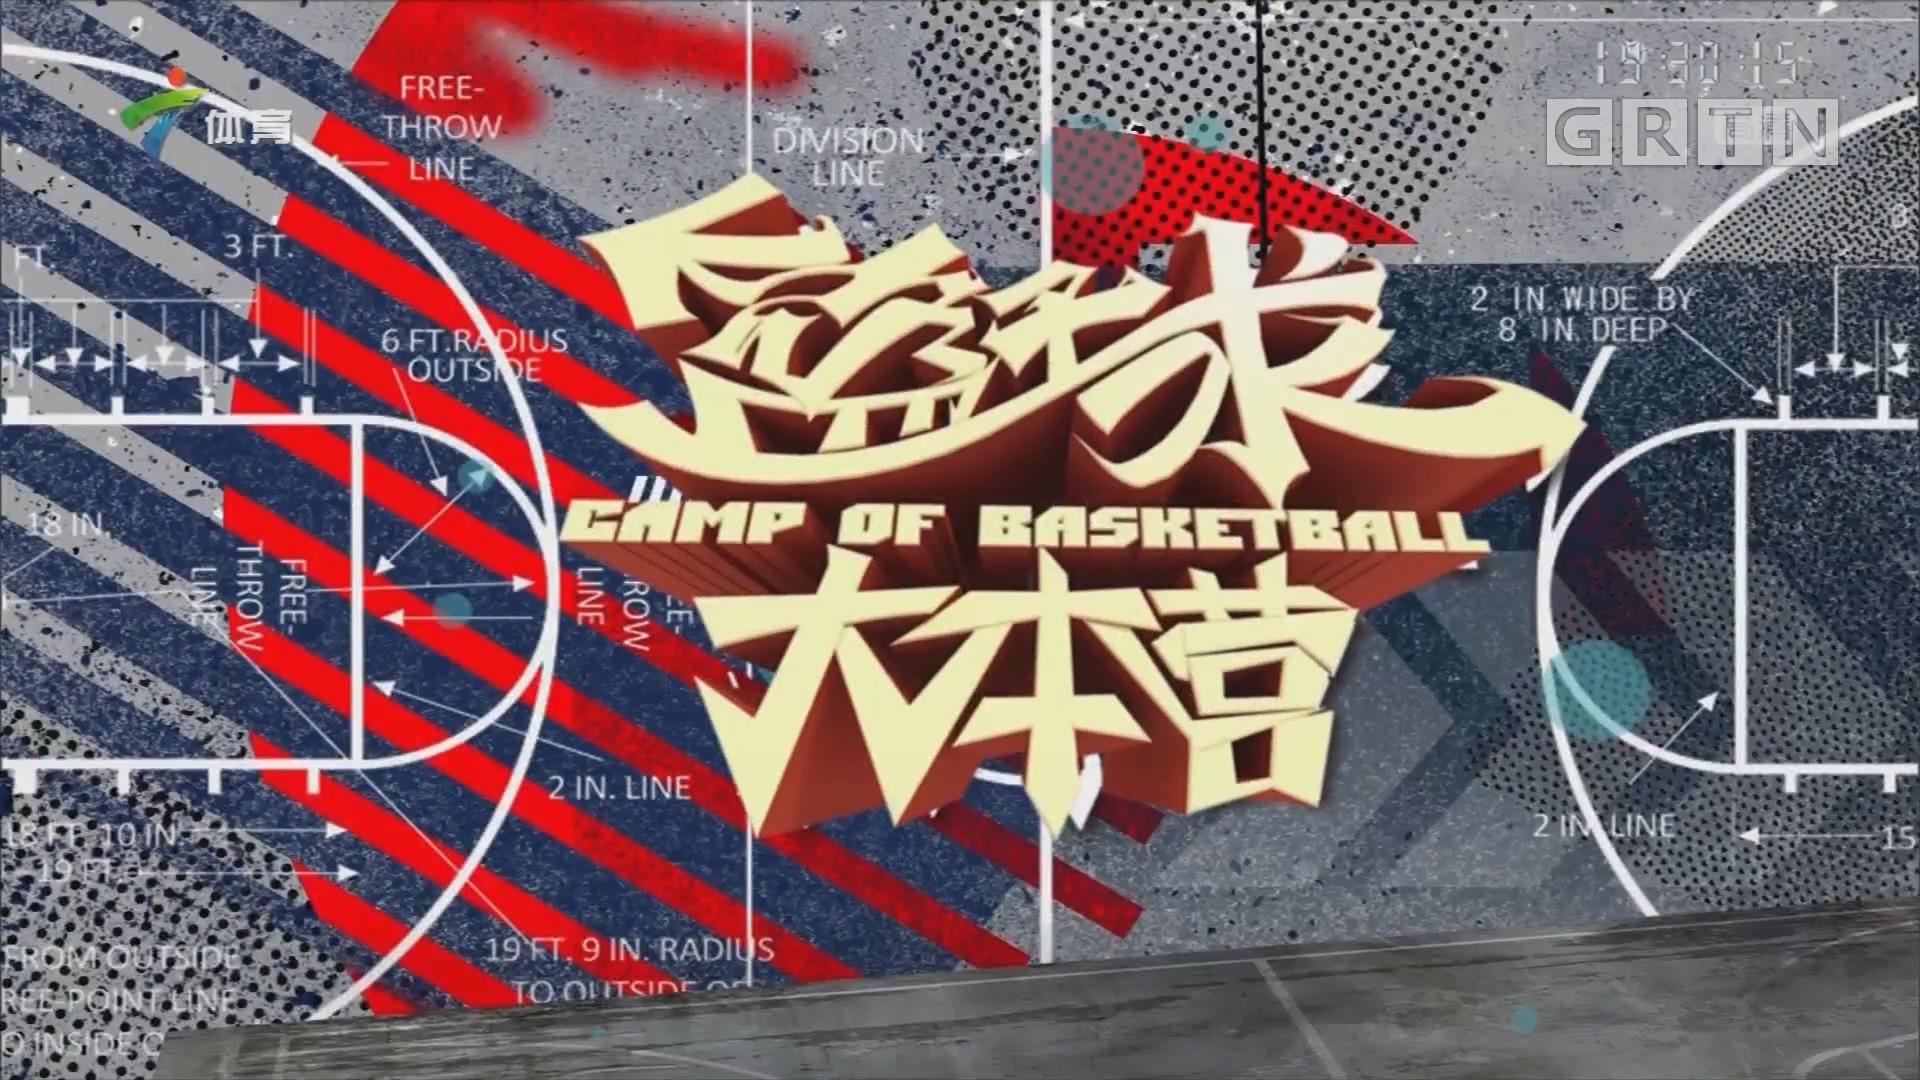 [HD][2019-03-28]篮球大本营:广东季后赛战幕拉开 杜家军双喜临门